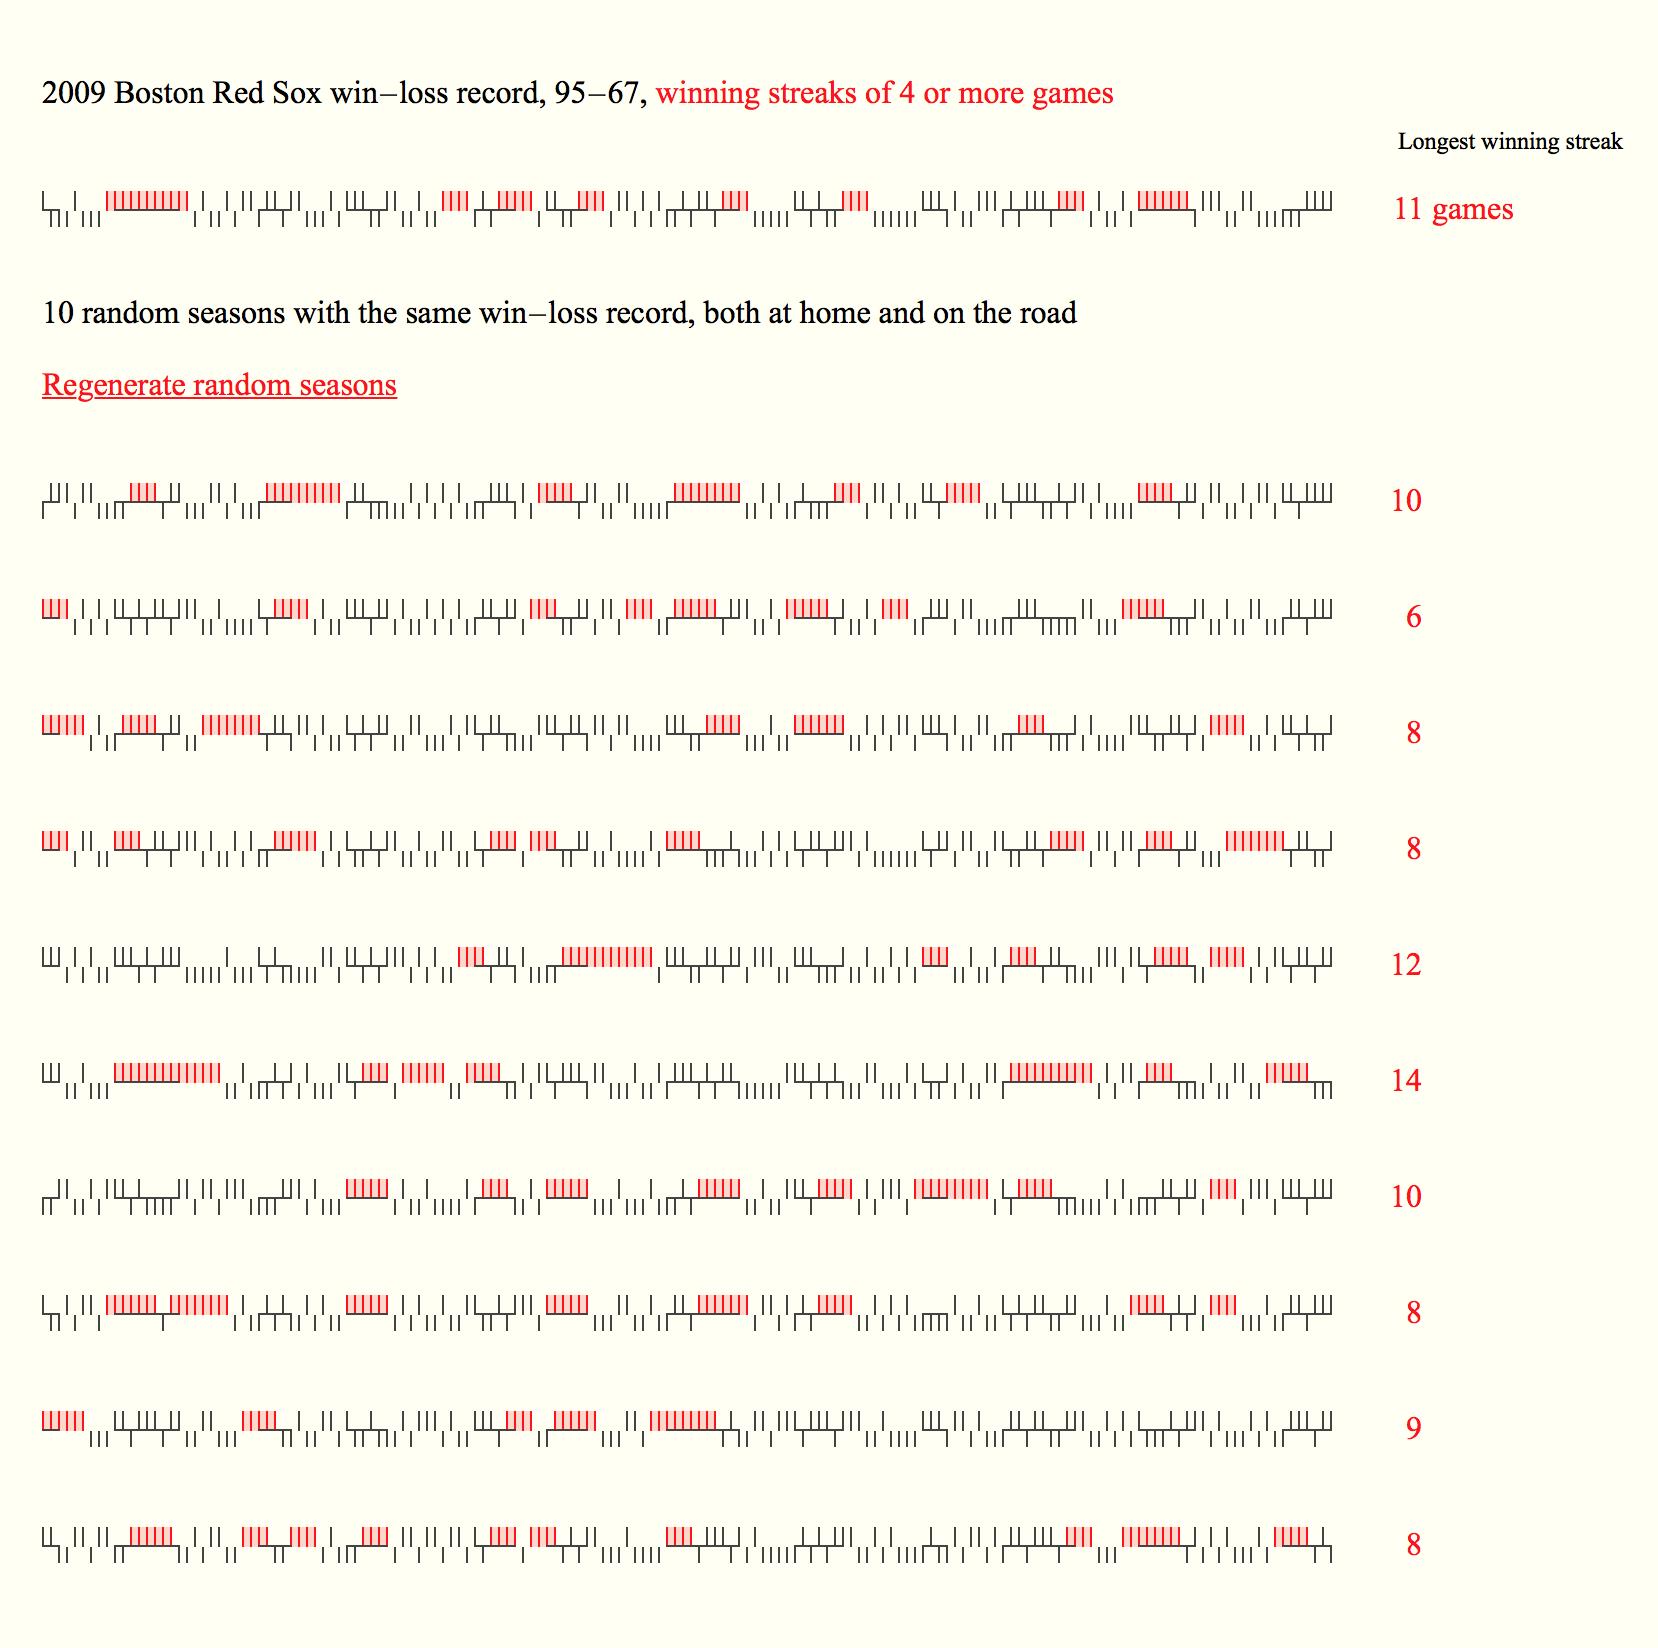 Set of randomized sparklines based on 2009 Boston Red Sox record